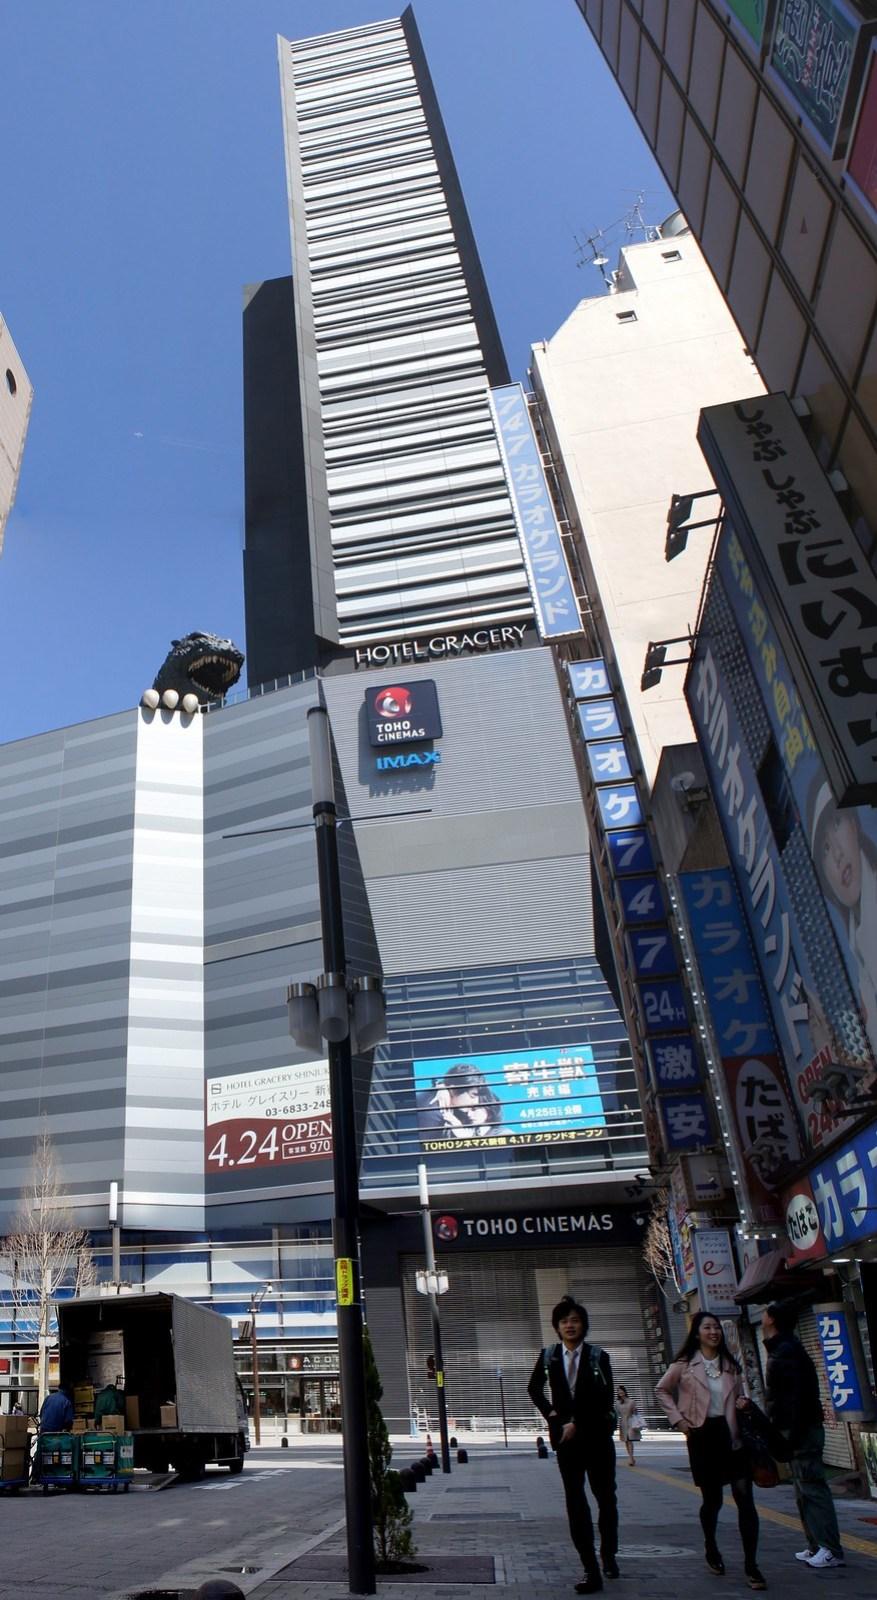 TOHO Cinemas Shinjuku Godzilla attraction